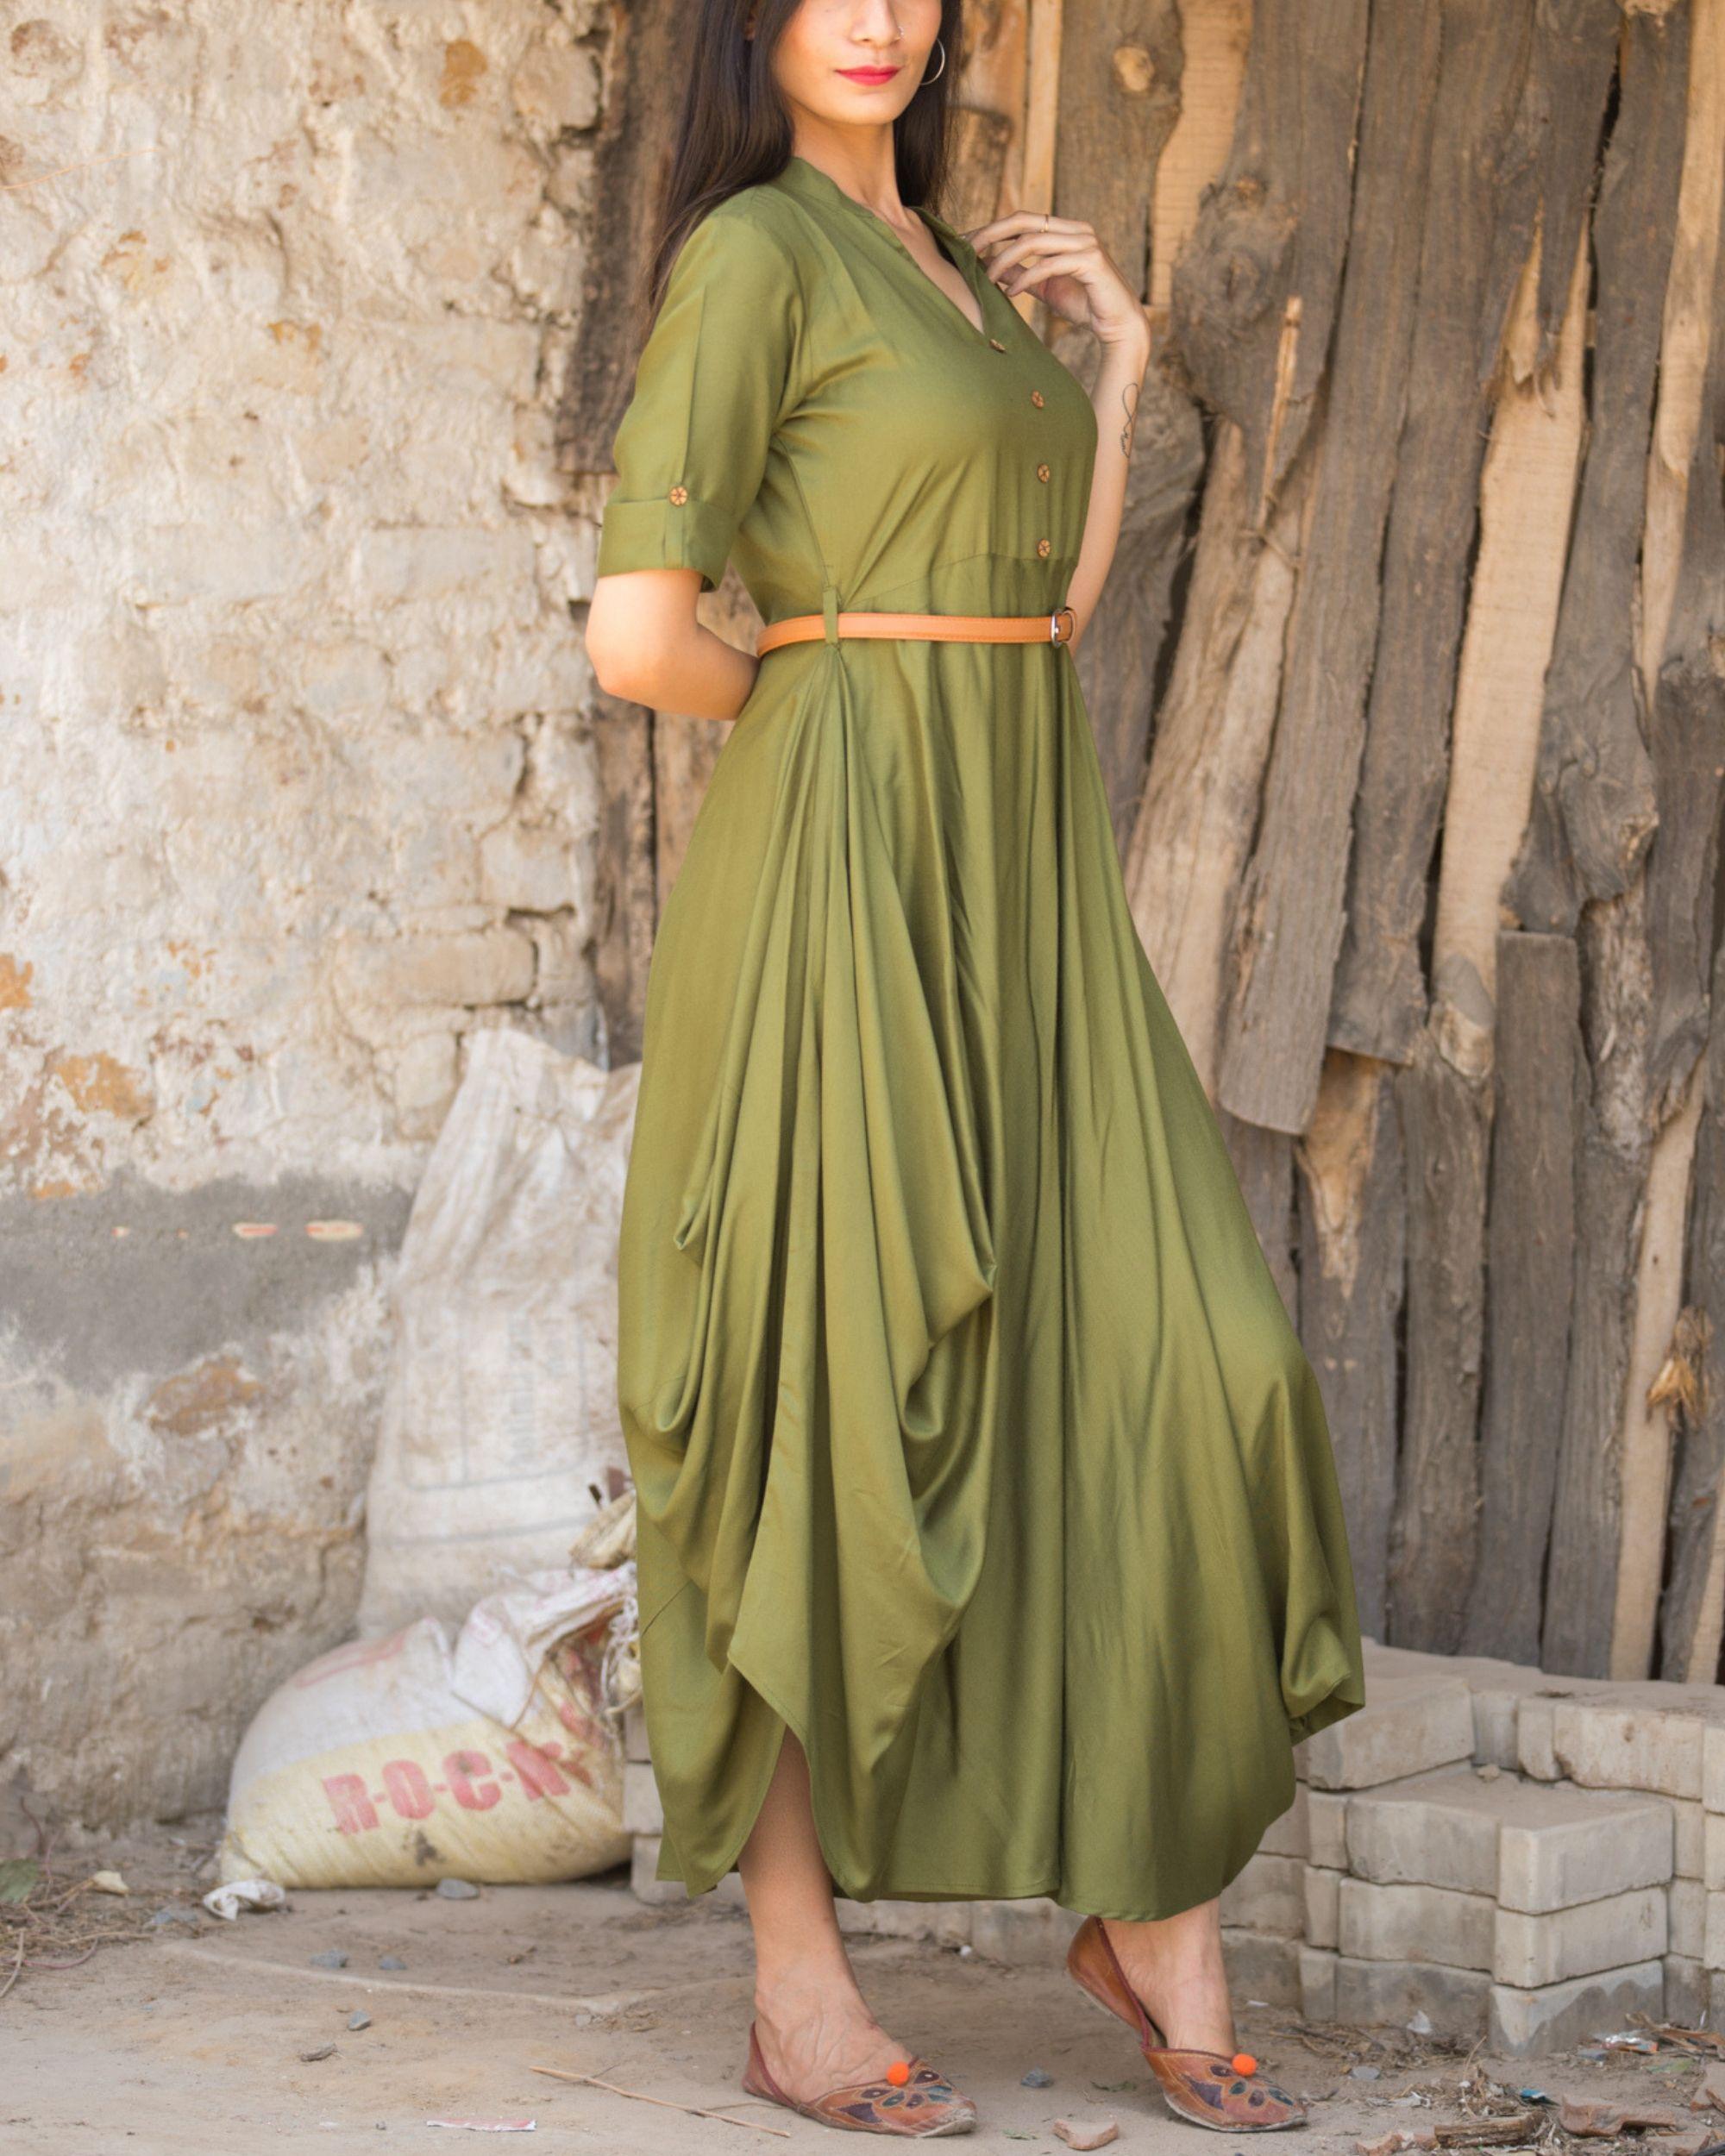 Olive Dress,Green Maxi Dresses,Olive Maxi Dresses,Belt Dress,olive dress,